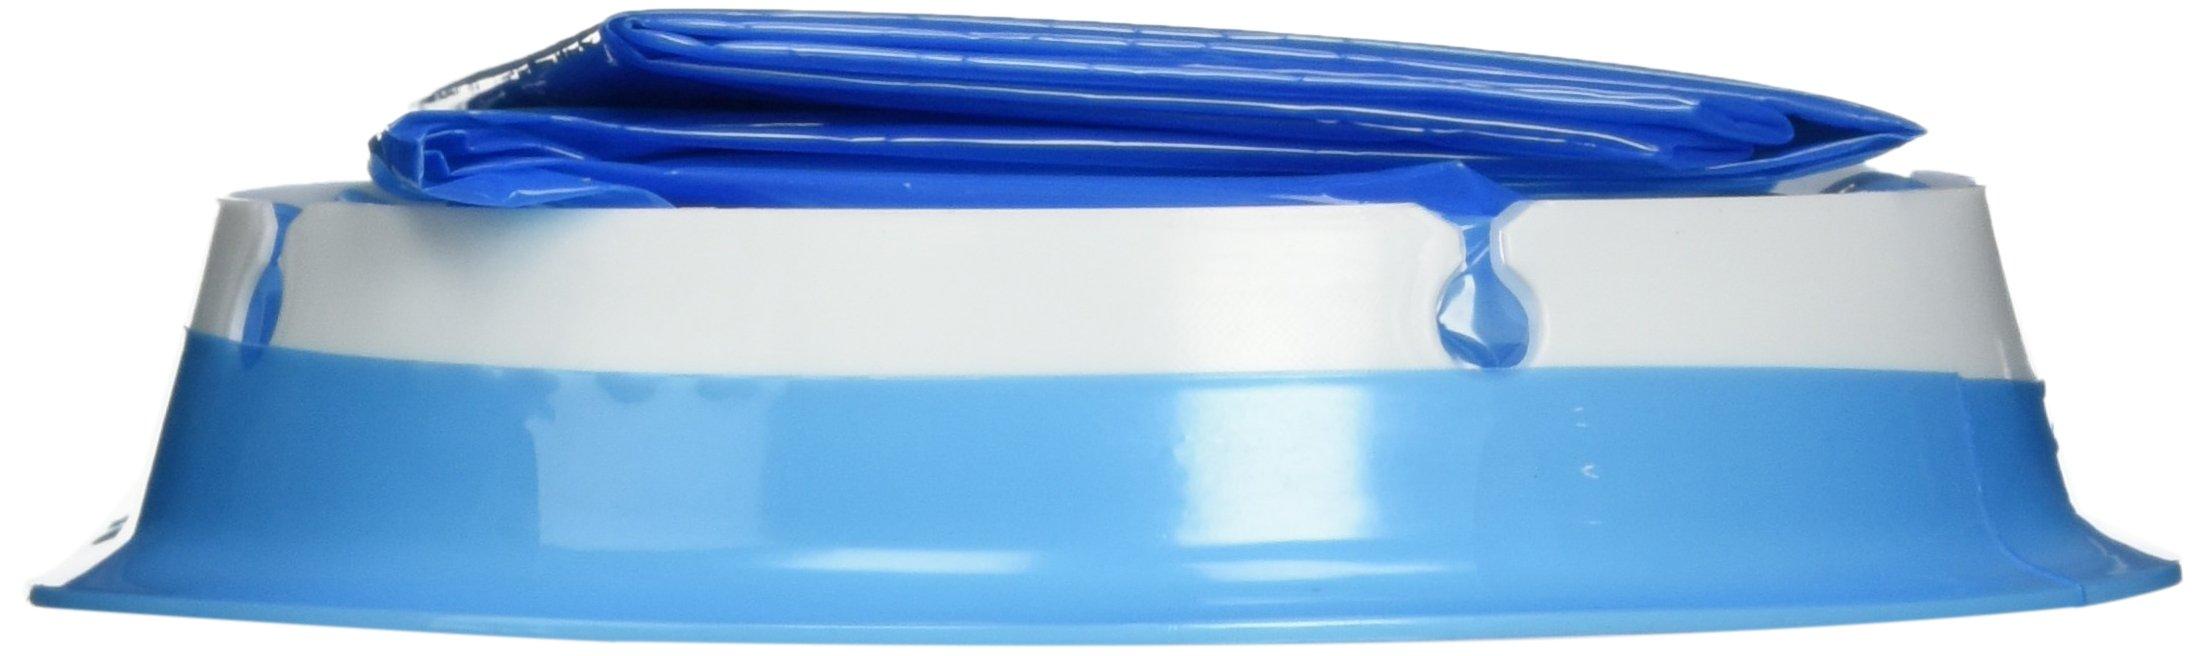 Medline Emesis Bags, Blue, 24 Count